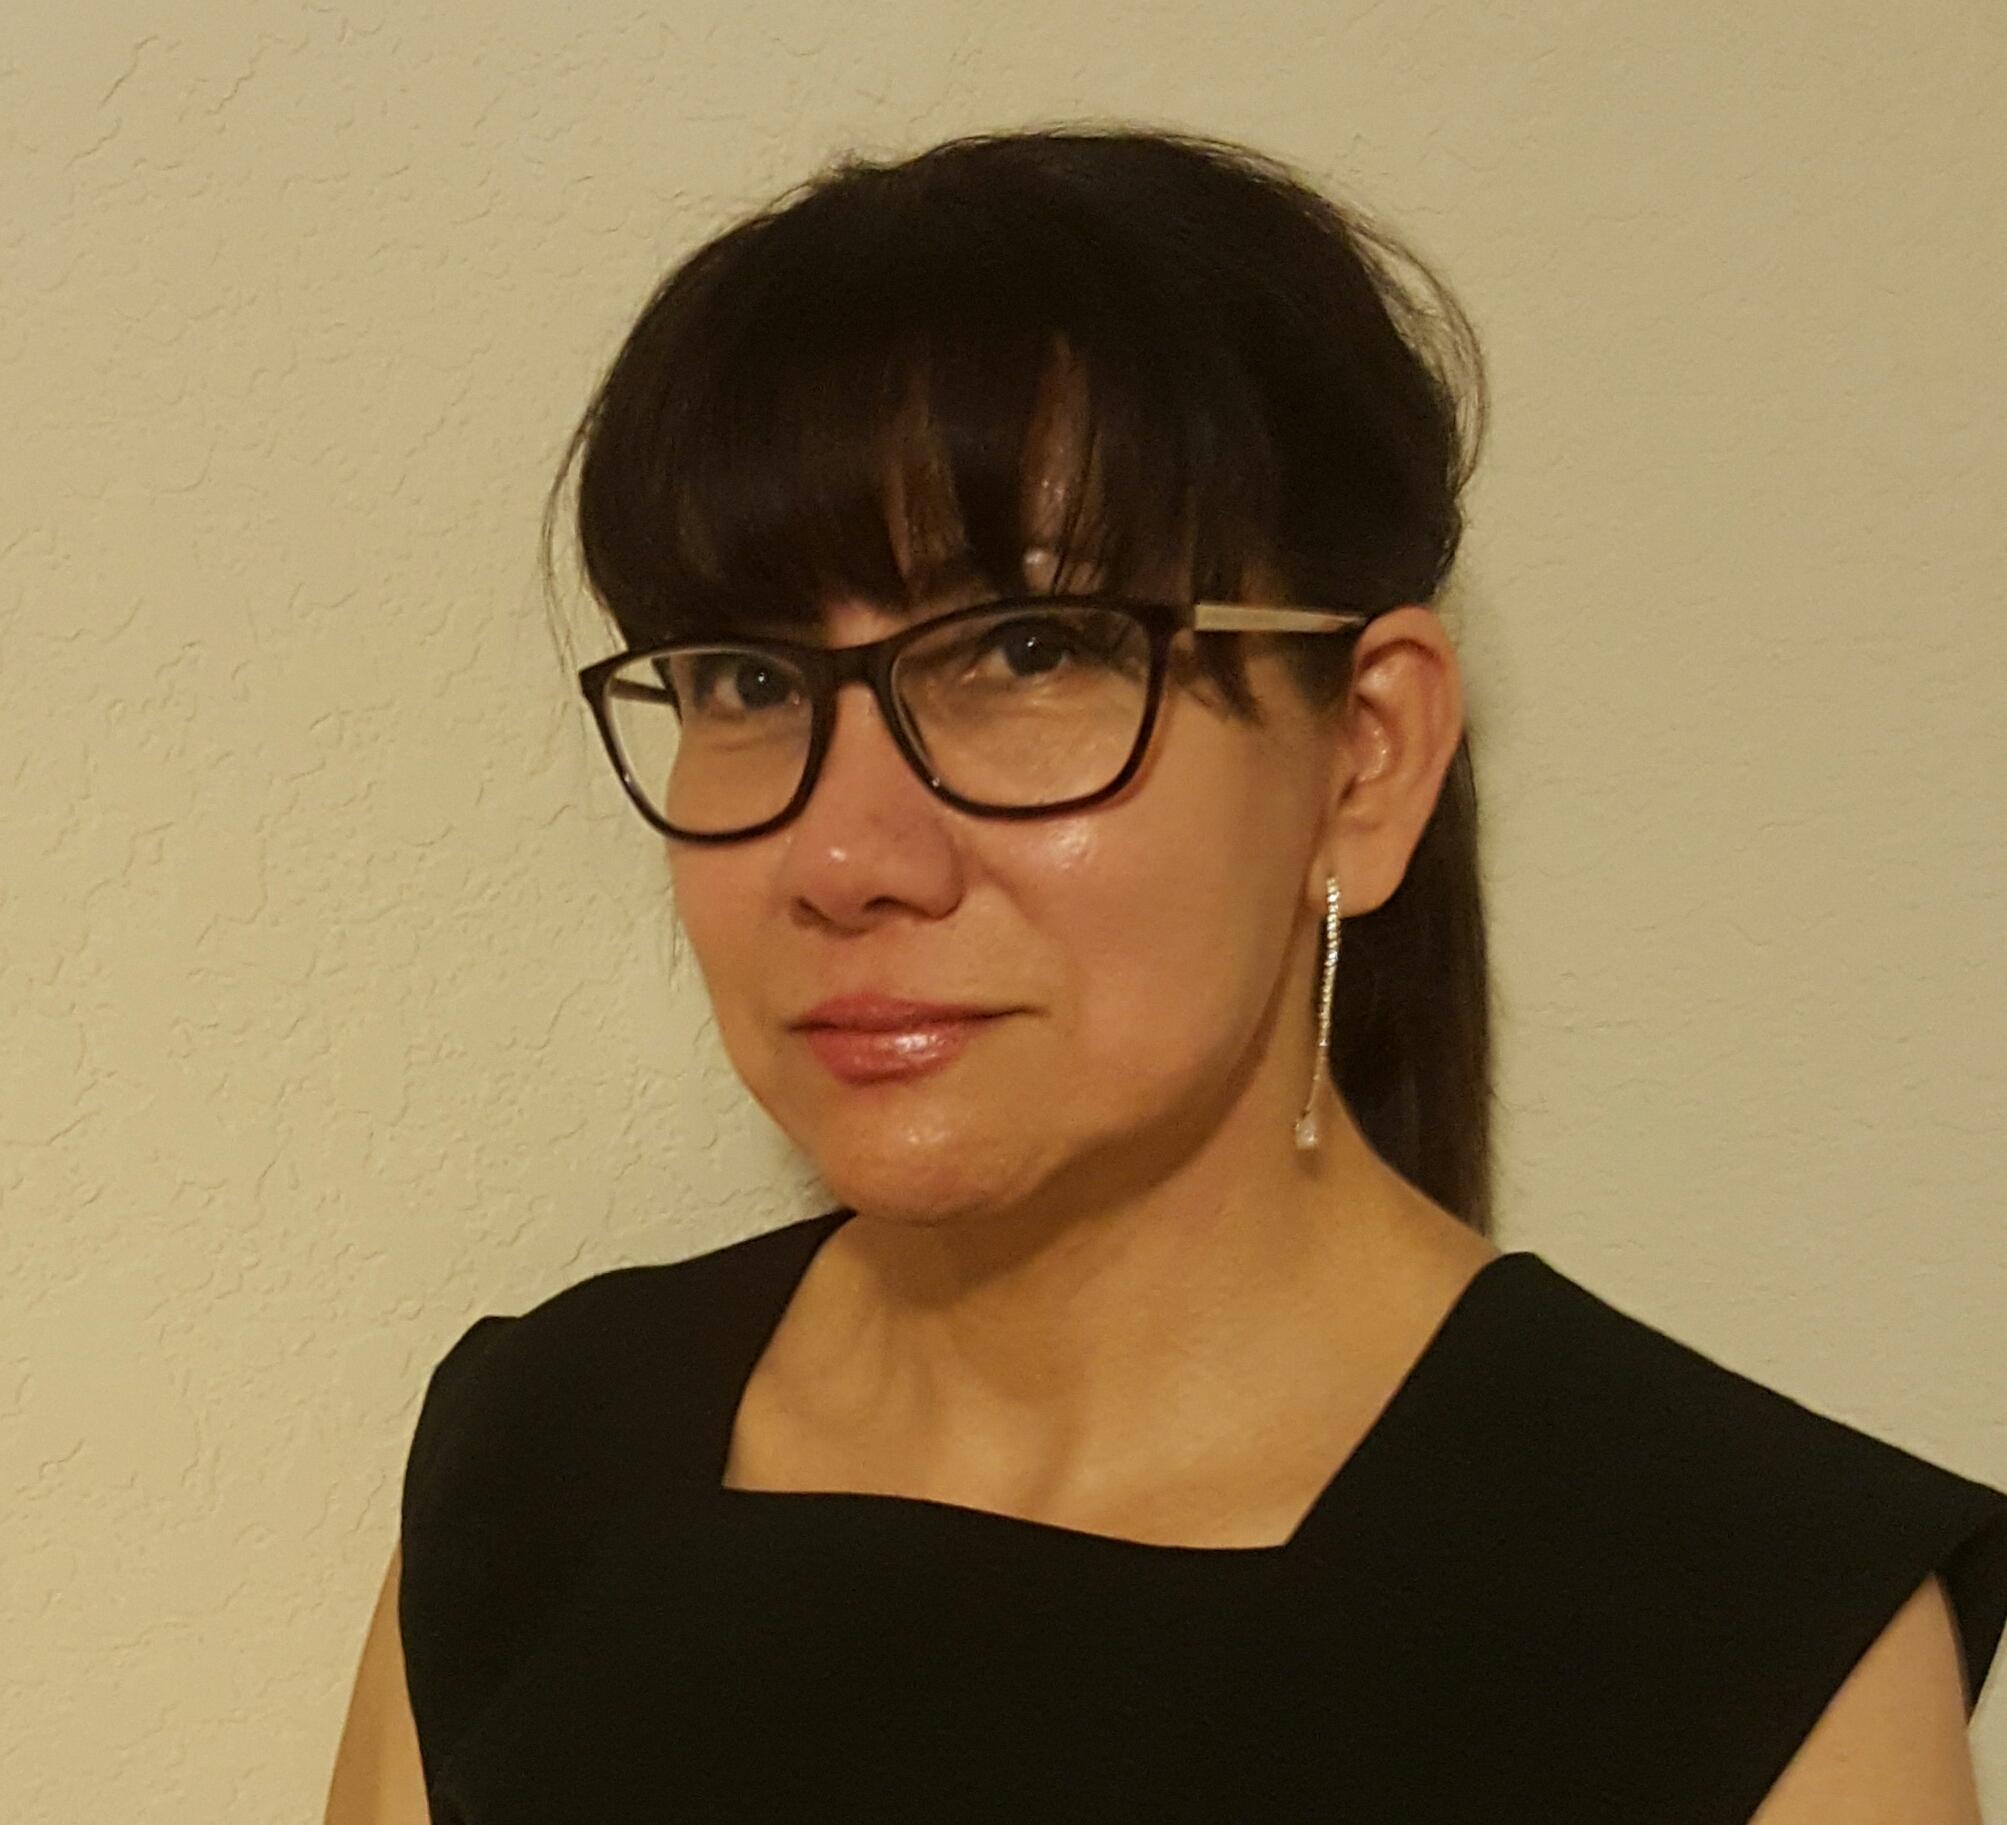 SWAPLA Designated Member - Ana Alvarez, Assistant Director and Pre-Law AdvisorUniversity of Texas at San AntonioInstitute for Law and Public AffairsPhone: 210-458-2990ana.alvarez@utsa.edu